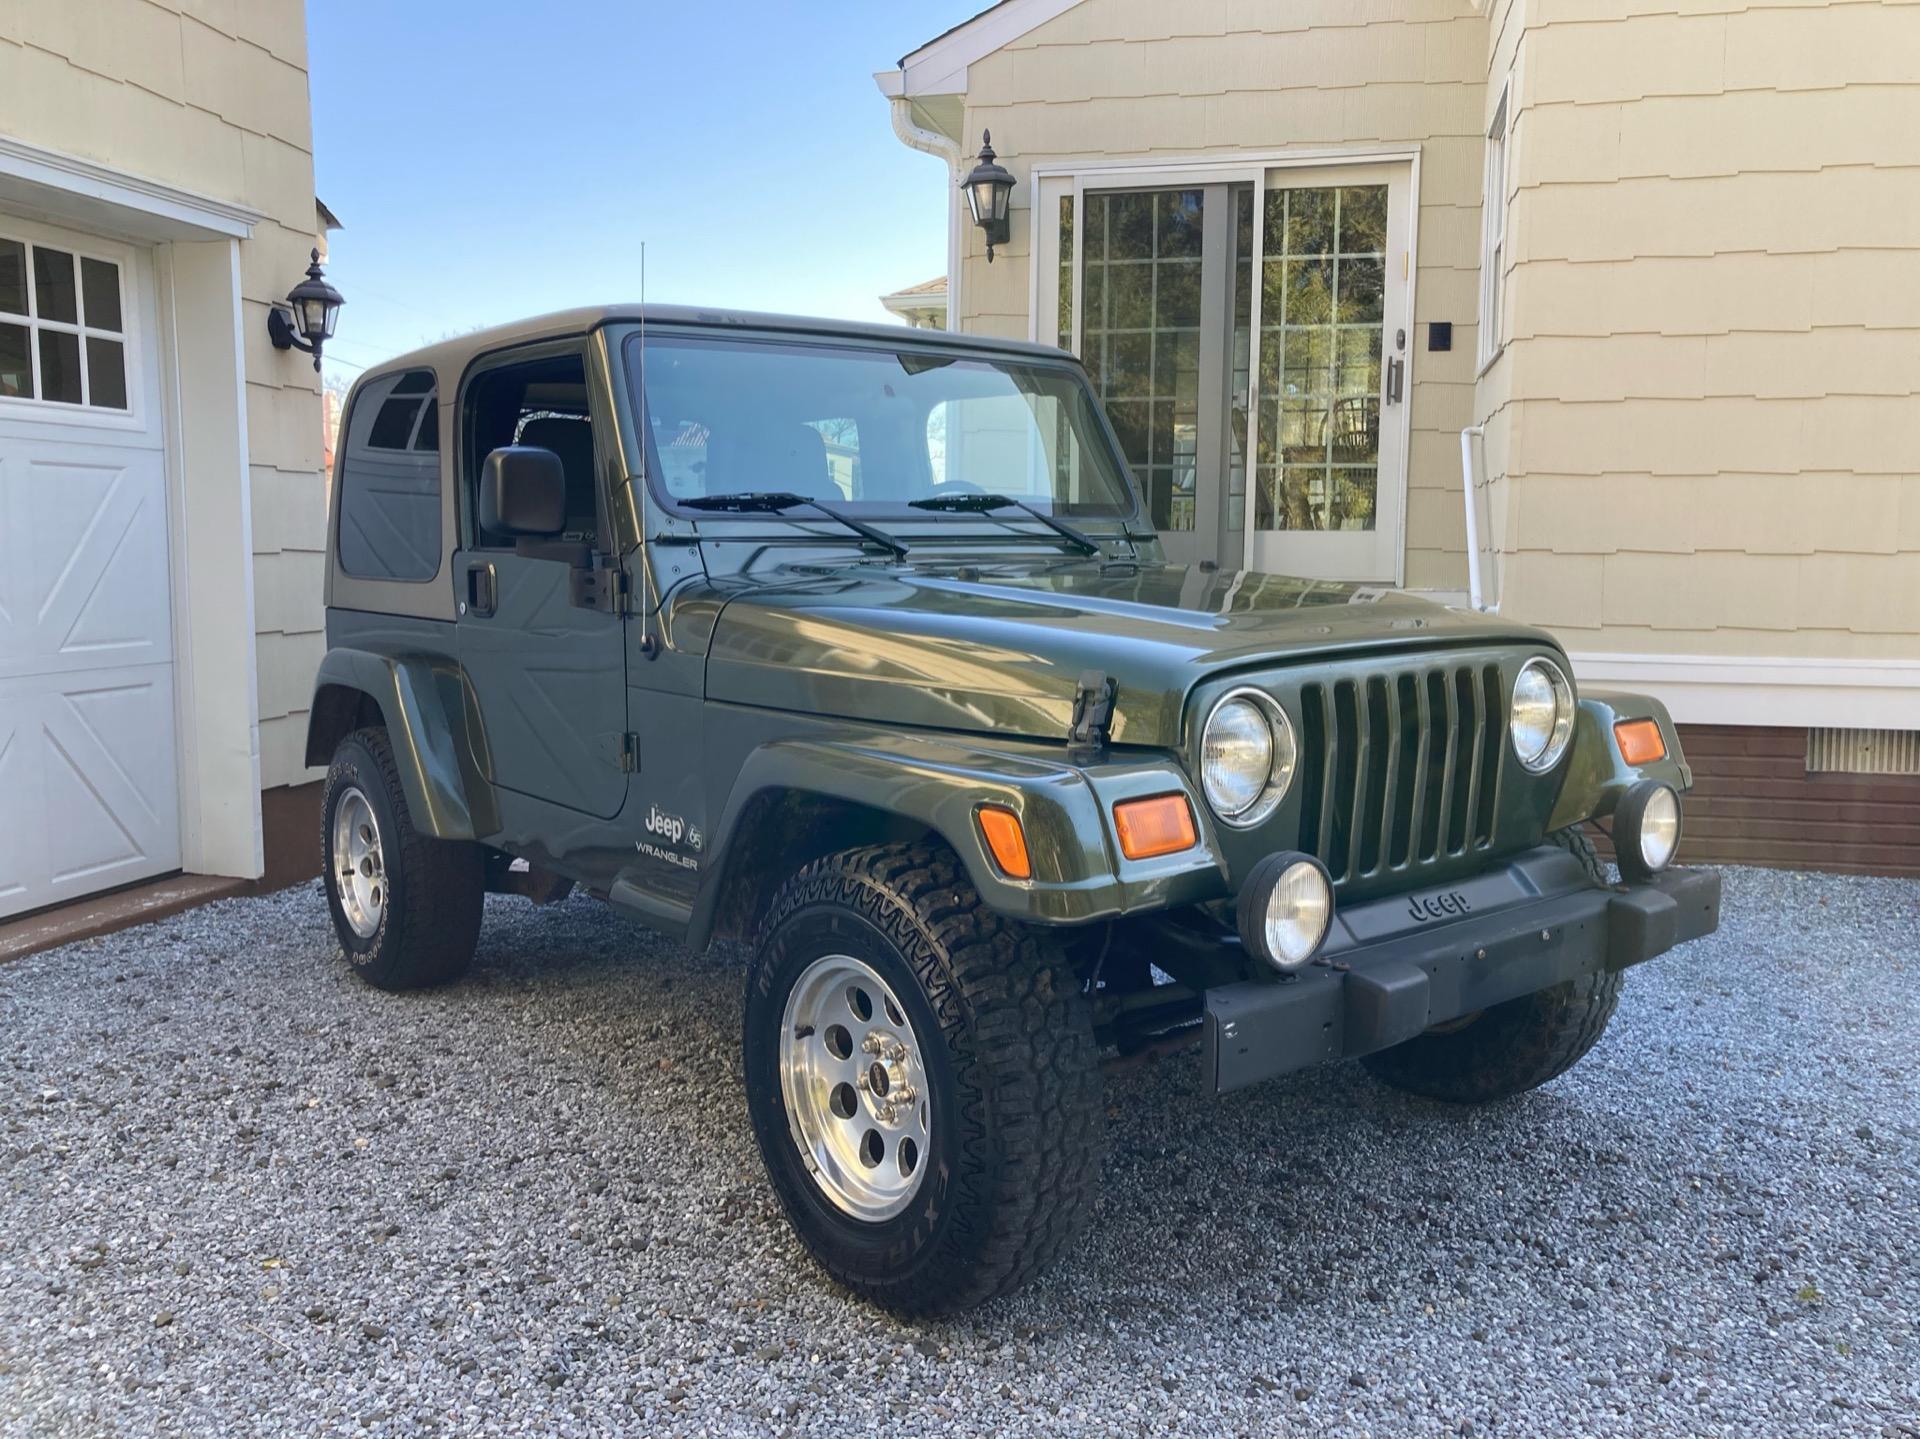 Used-2006-Jeep-Wrangler-65th-Anniversary-Edition-X